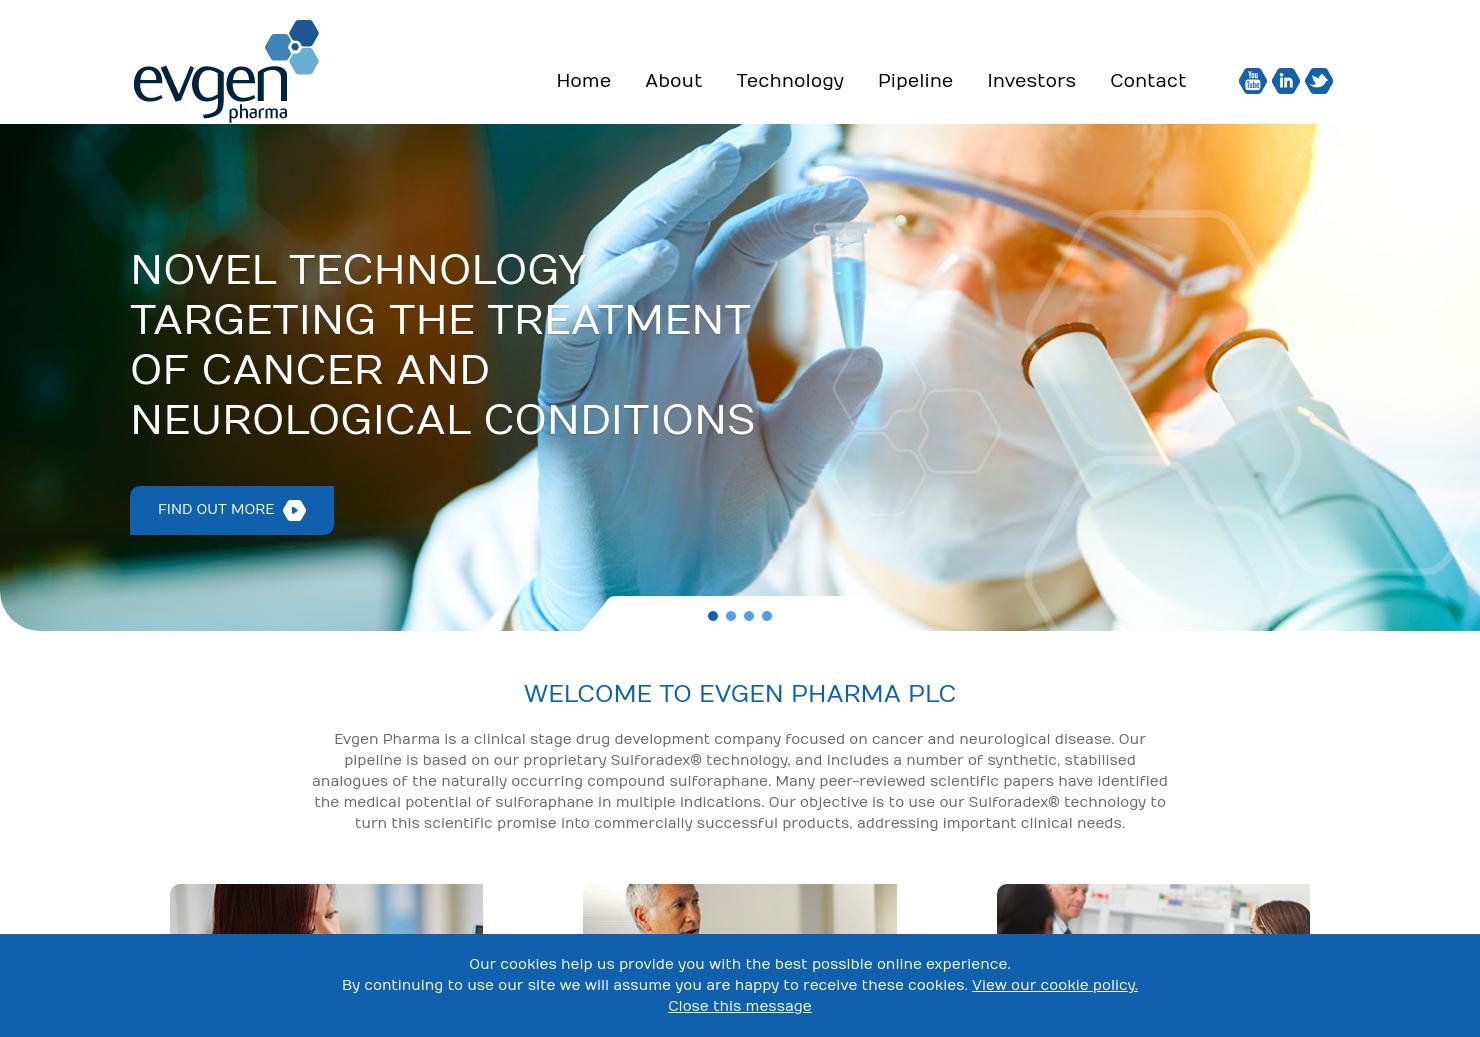 Evgen Pharma Home Page